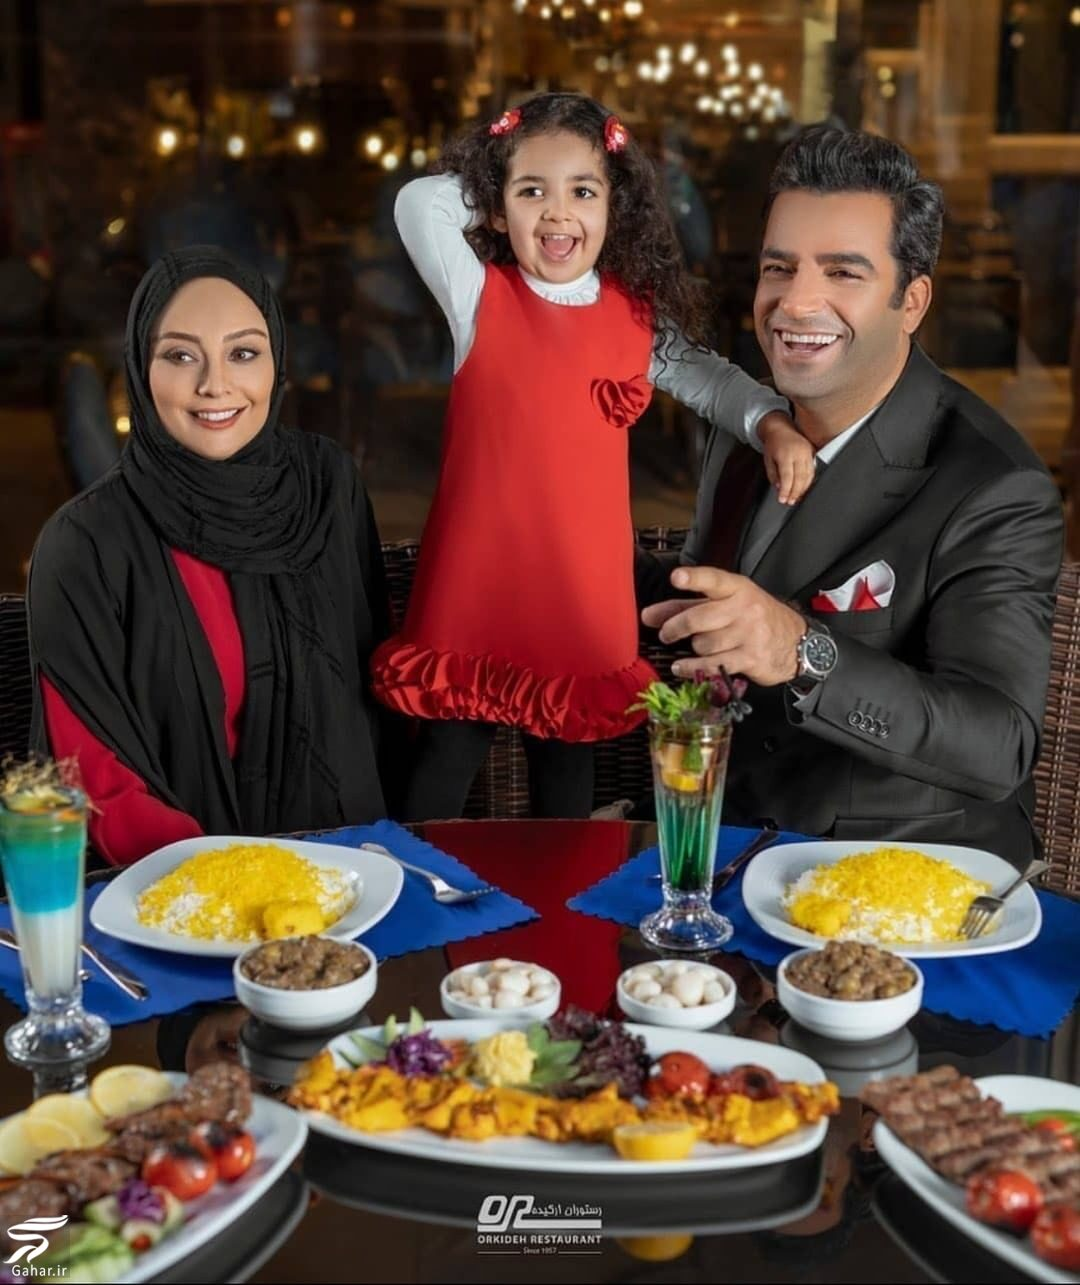 848764 Gahar ir عکسی از شام لاکچری منوچهر هادی و همسرش و دخترش